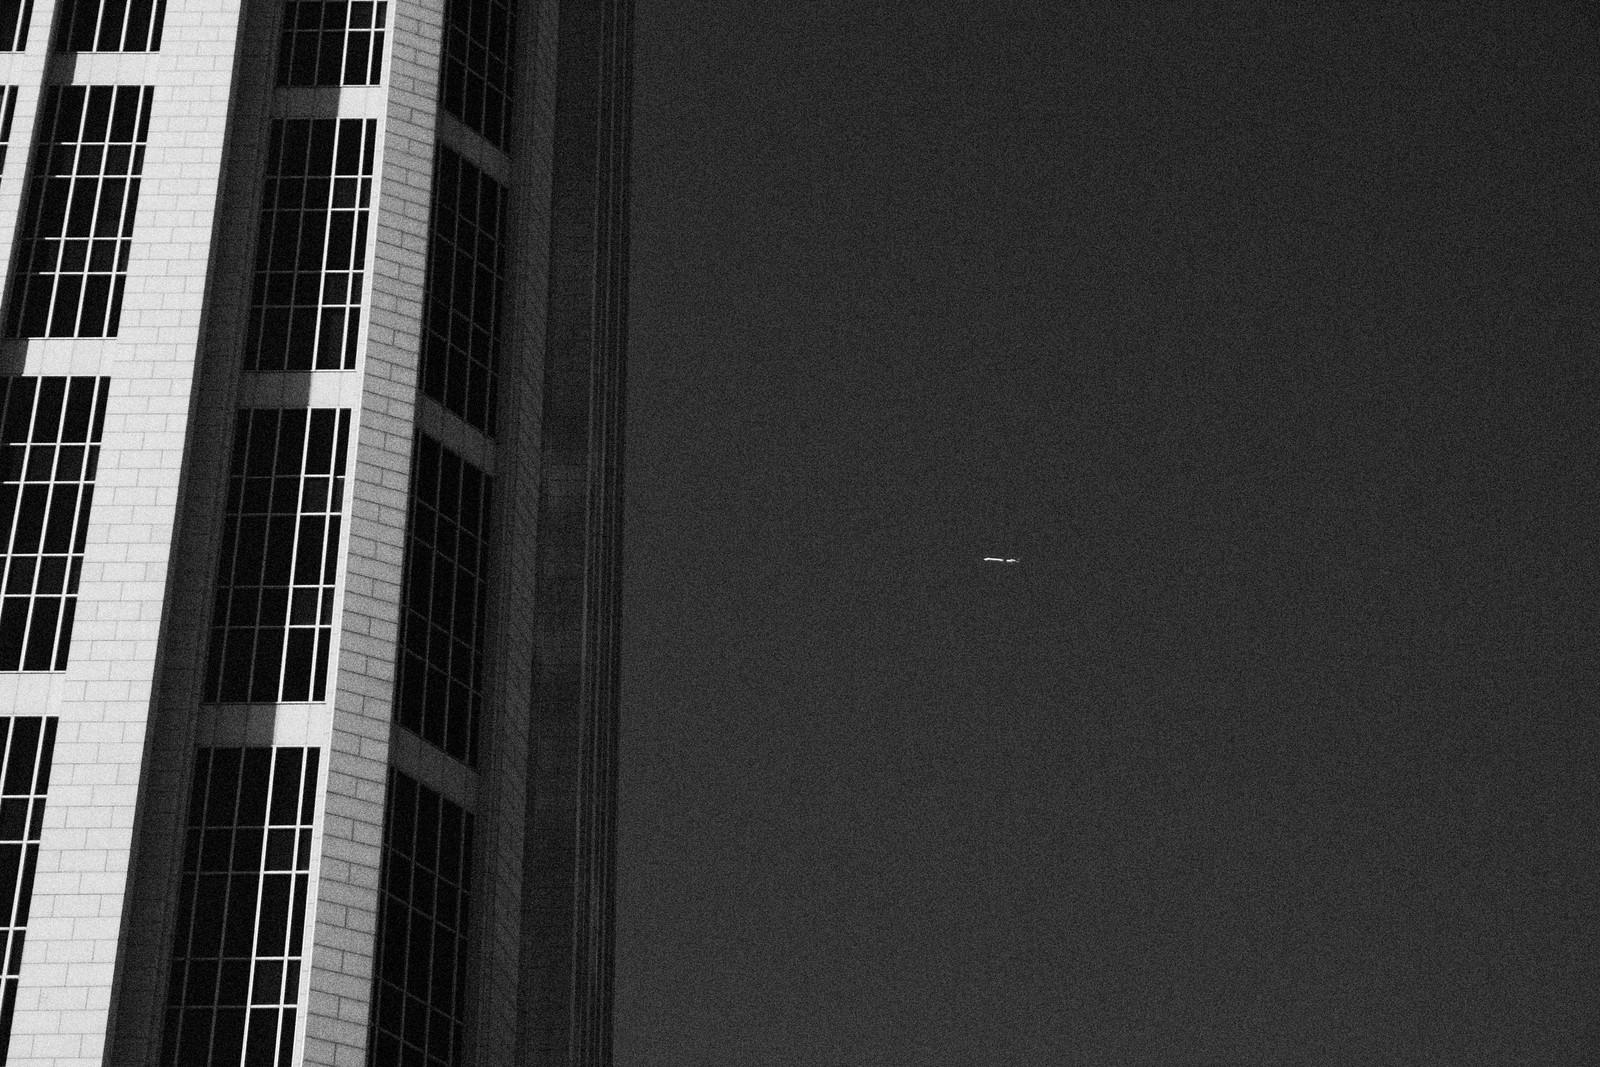 One Atlantic Center and Plane, Midtown Atlanta, 2007